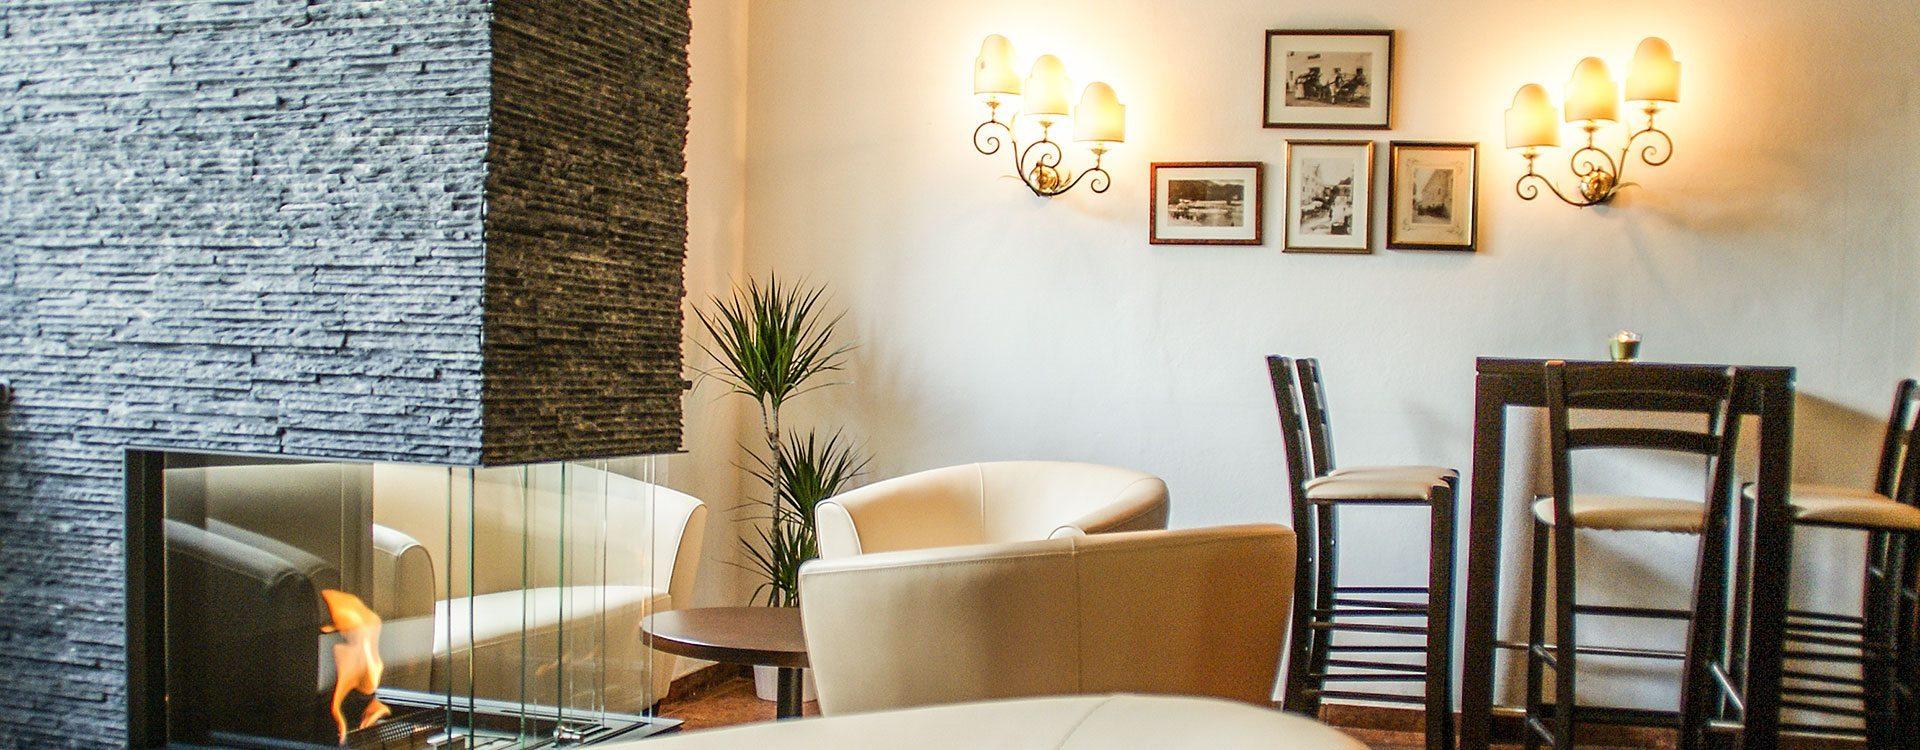 3 Sterne Hotel Neuwirt in Mauterndorf, Lungau